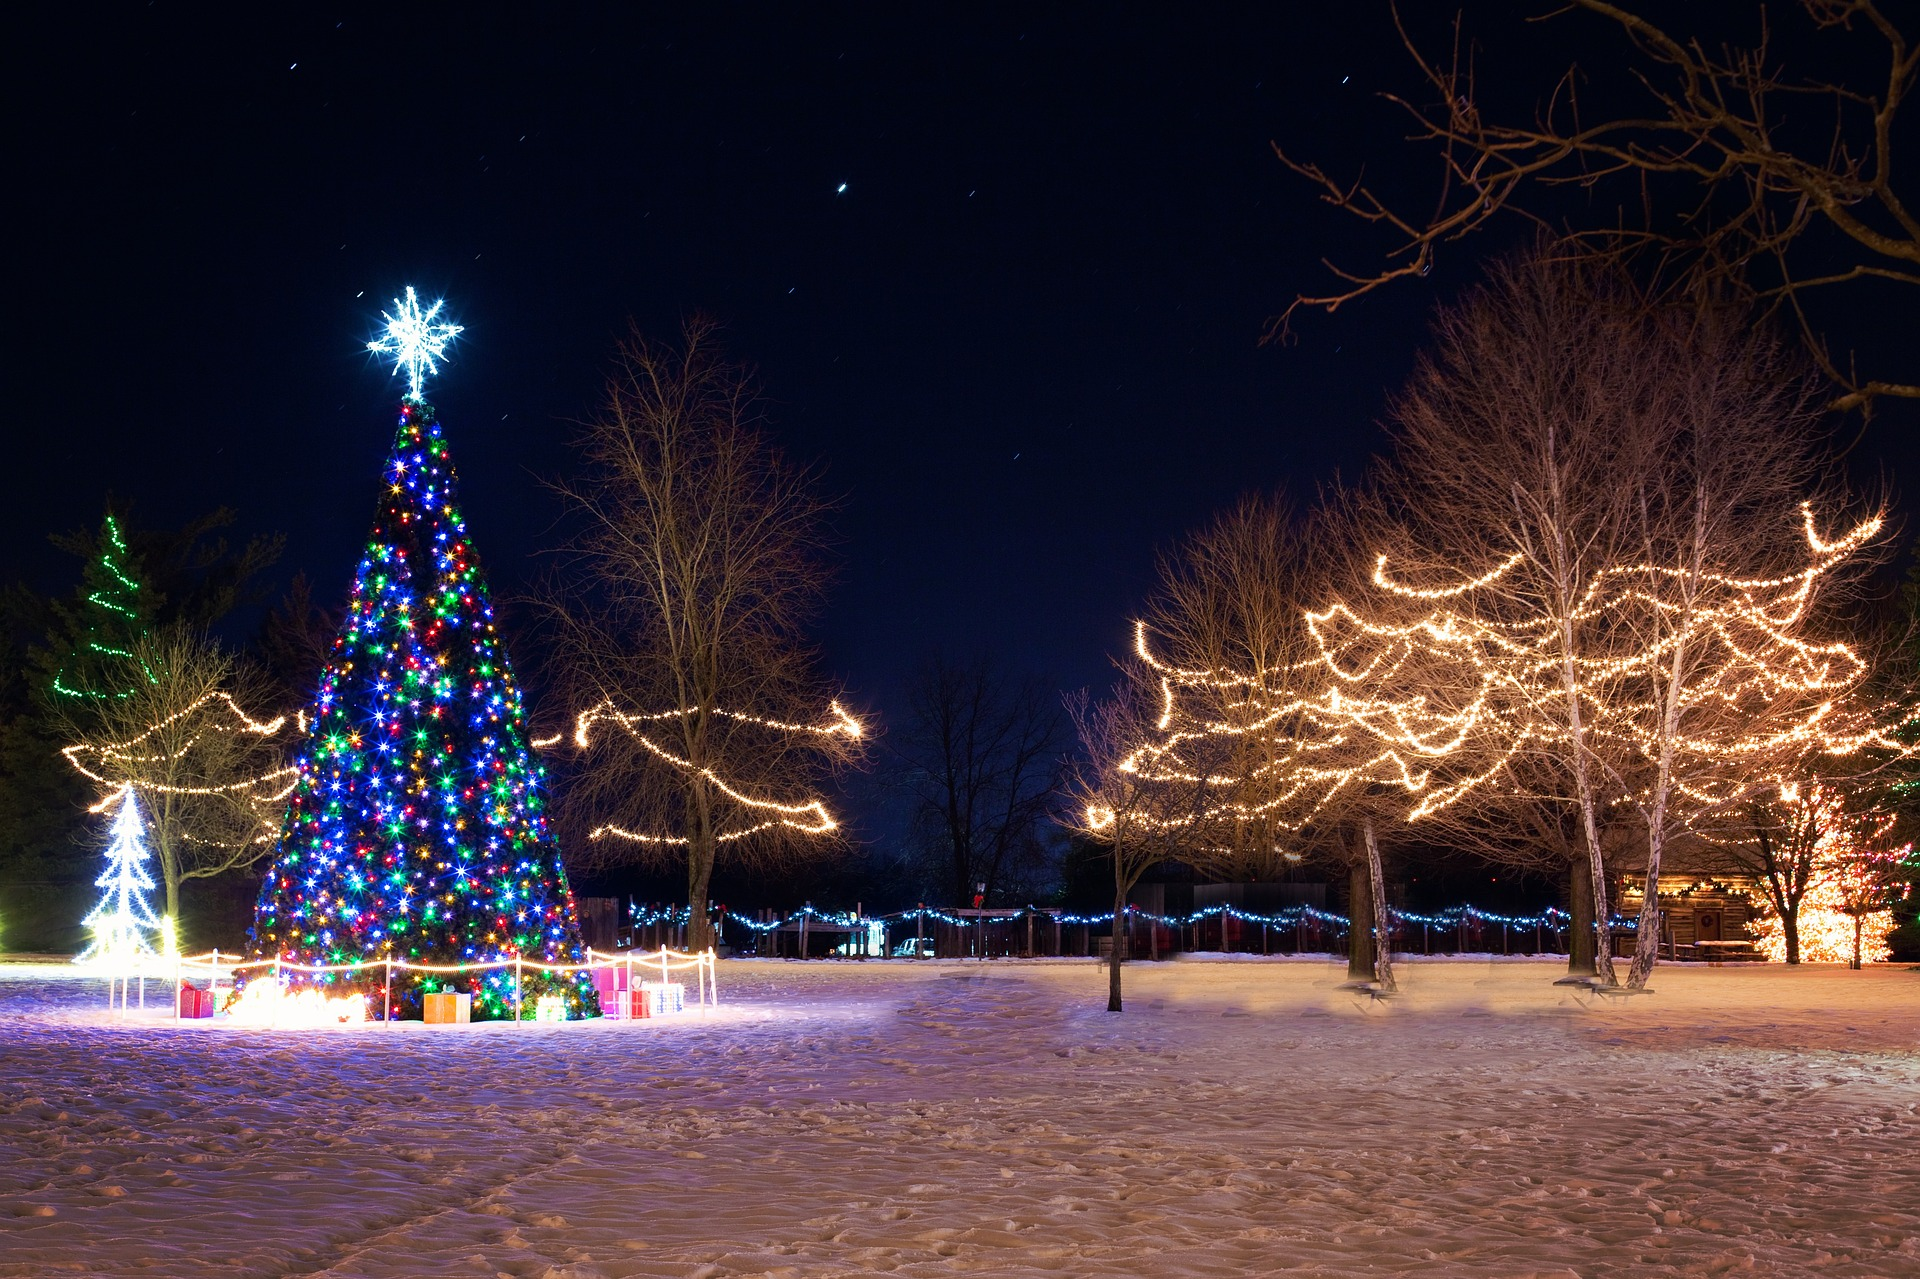 lights on large christmas tree for light up night